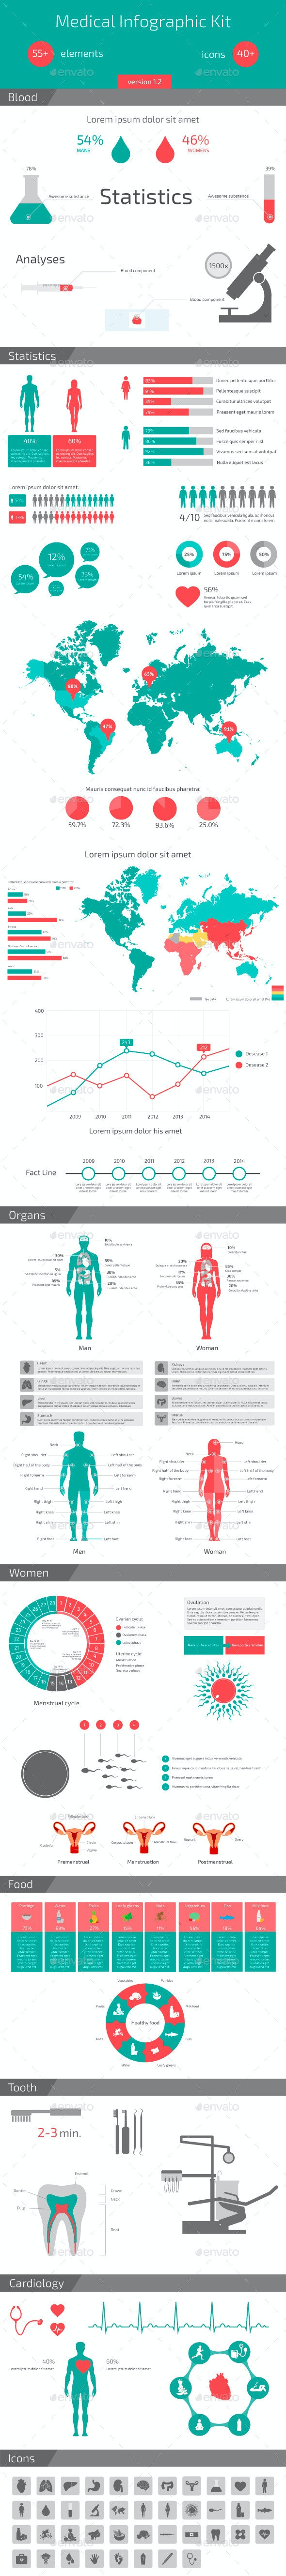 Medical Infographic Kit - Infographics